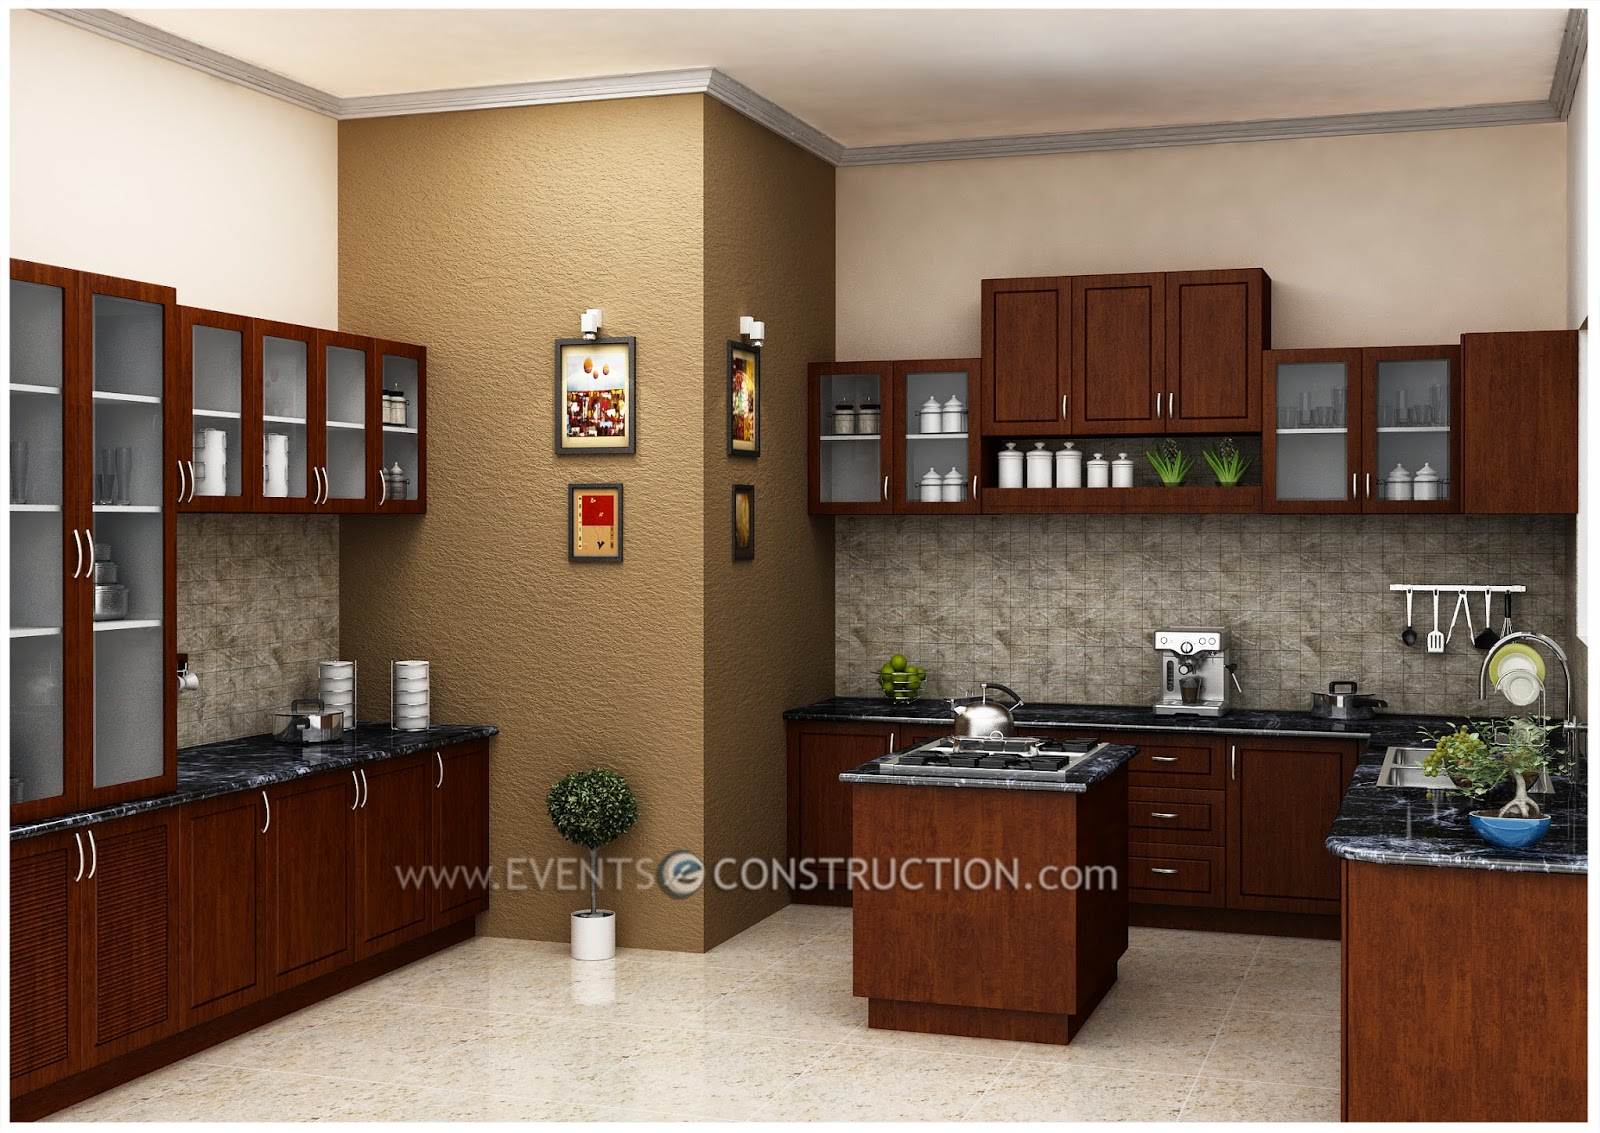 Evens Construction Pvt Ltd: Modern kitchen interior for ...